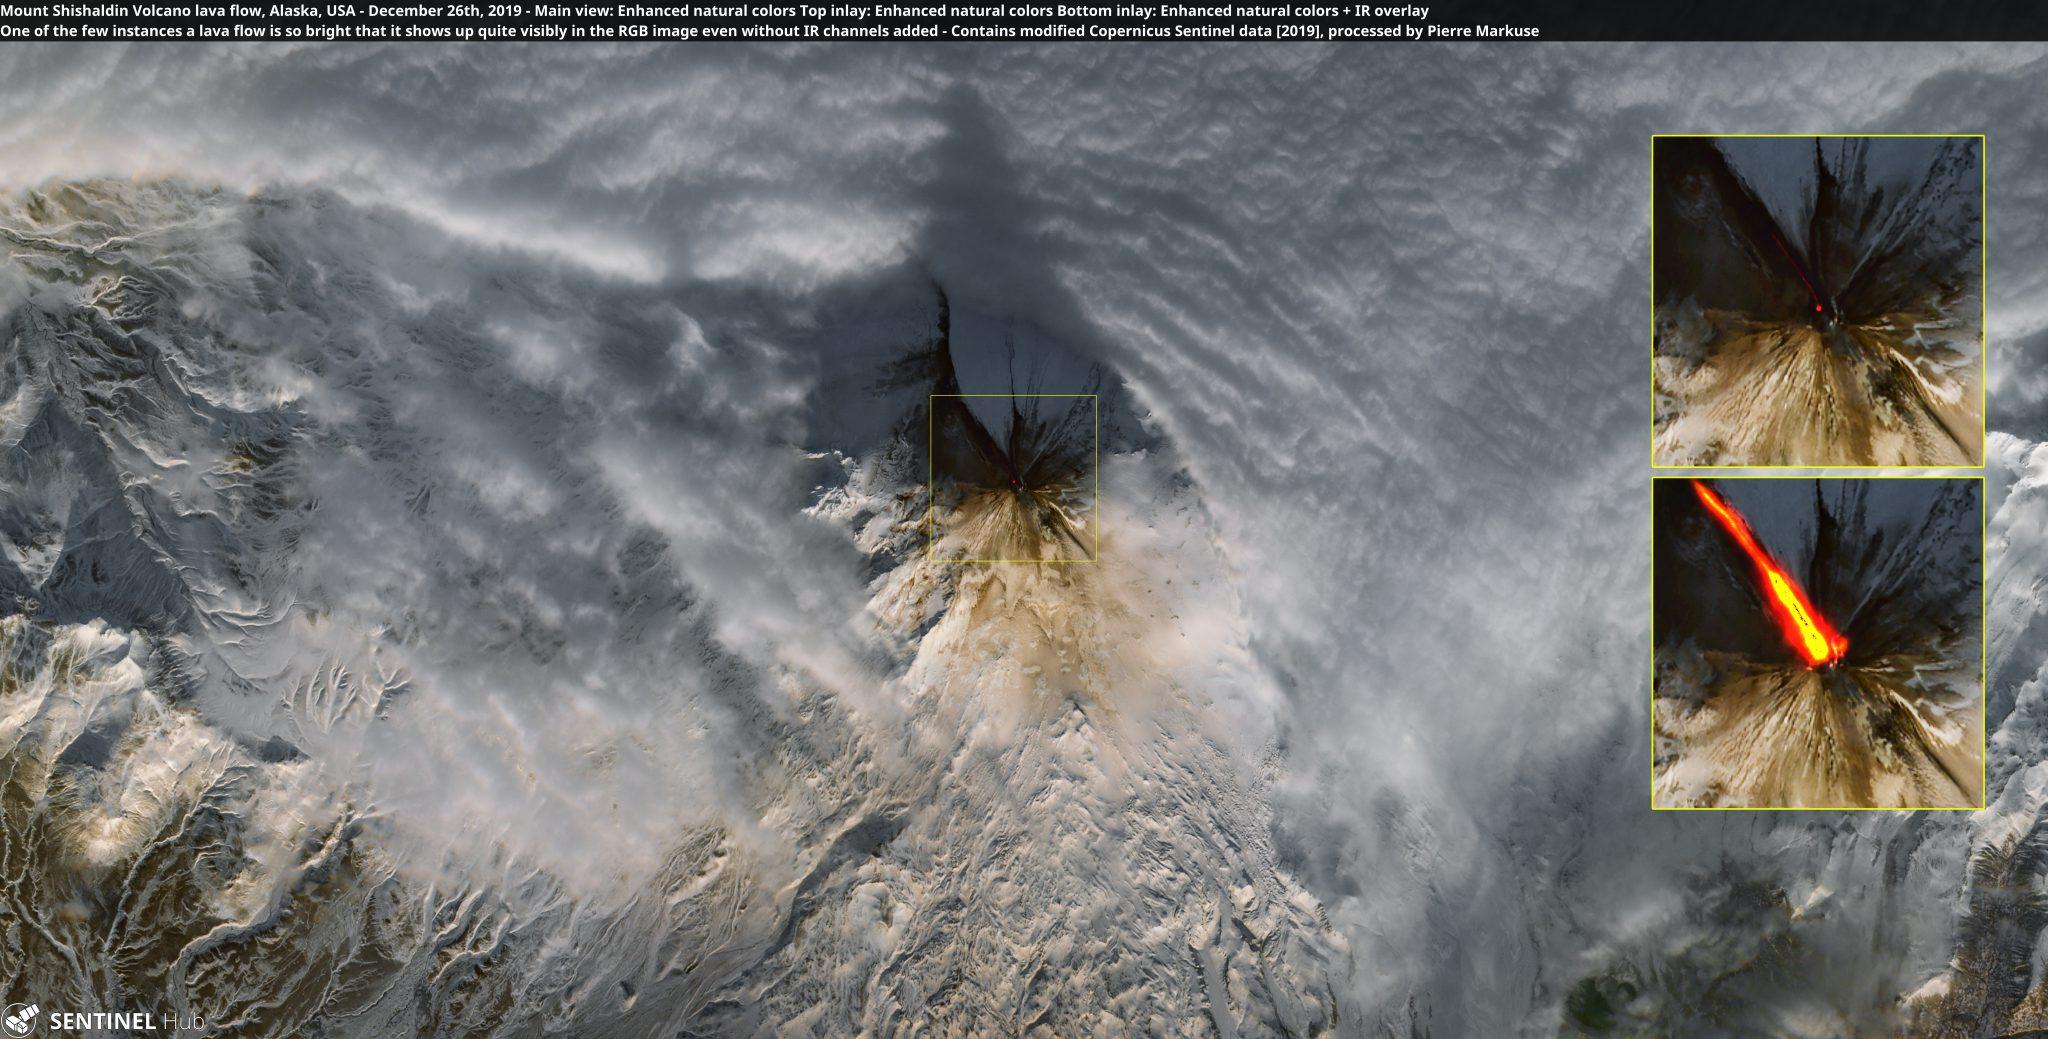 desc:Mount Shishaldin Volcano lava flow, Alaska, USA - December 26th, 2019 Copernicus/Pierre Markuse